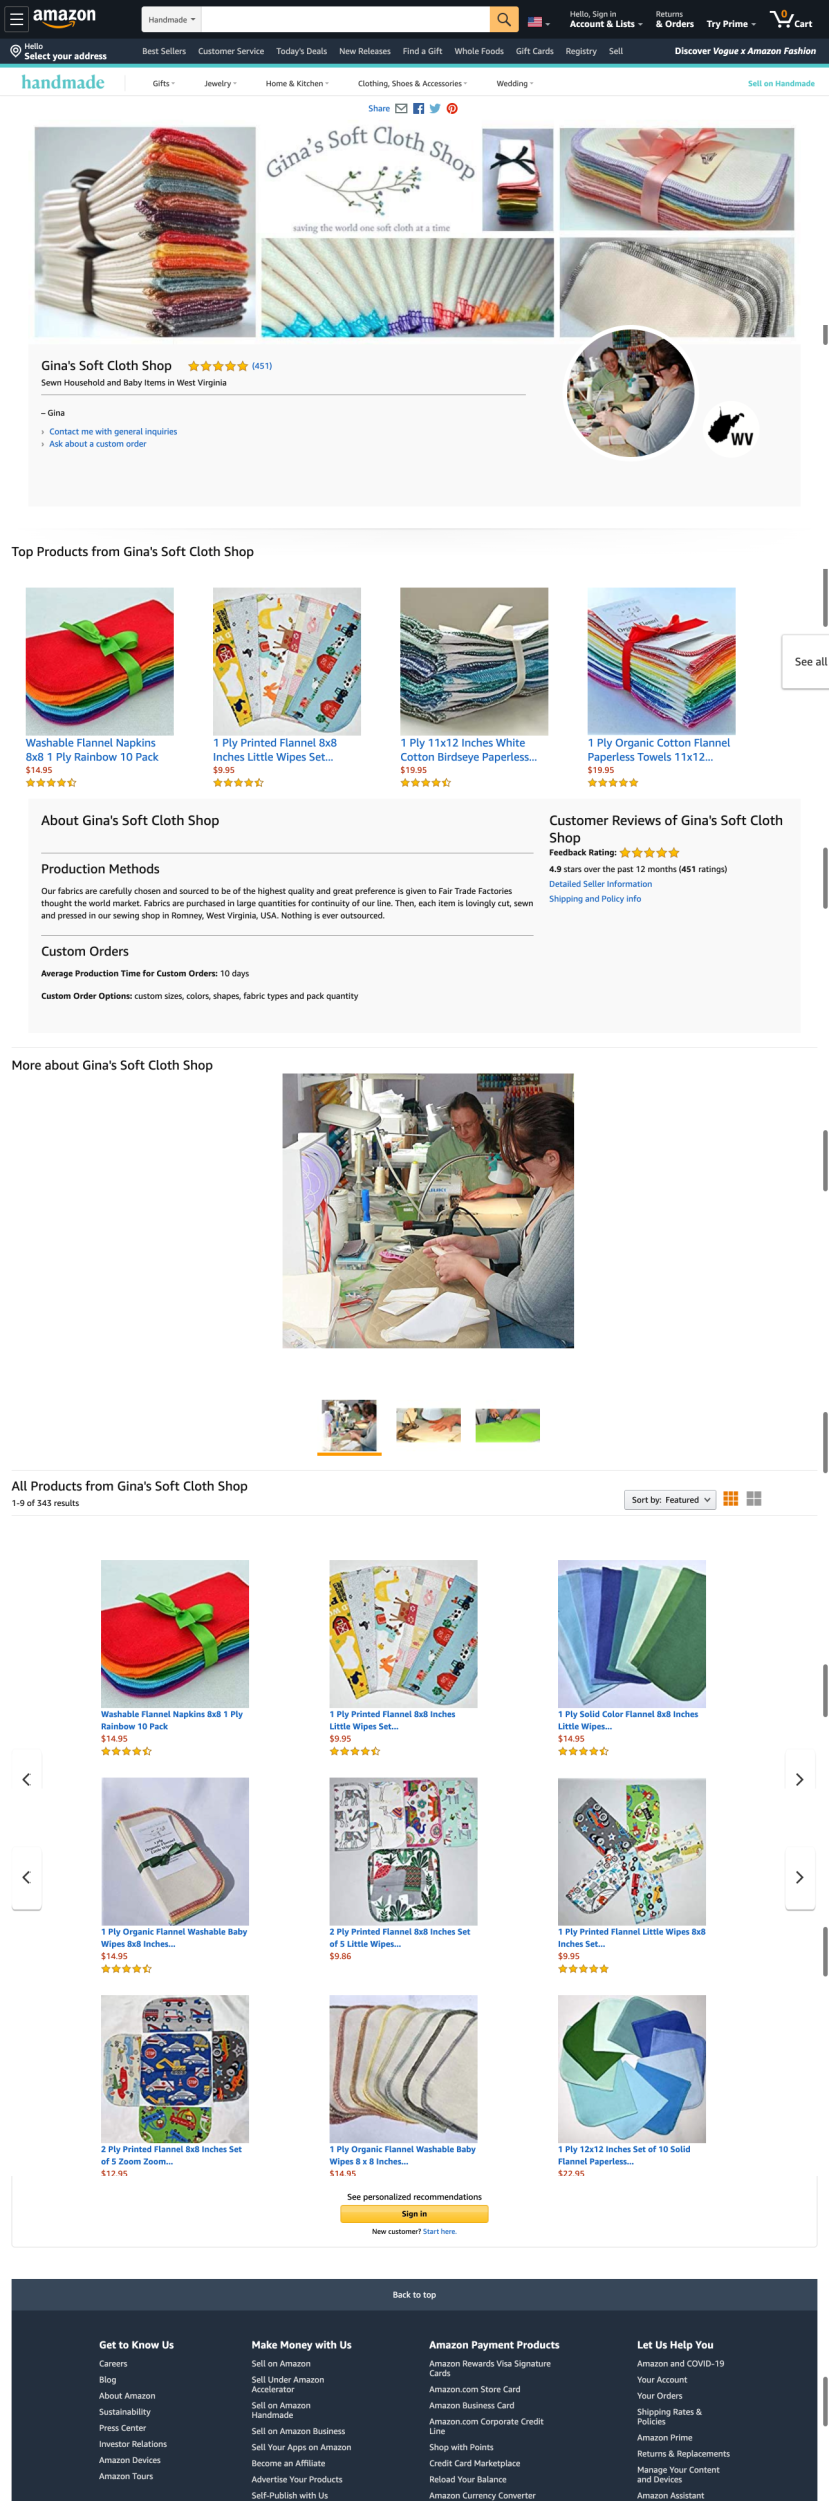 Gina's Soft Cloth Shop page